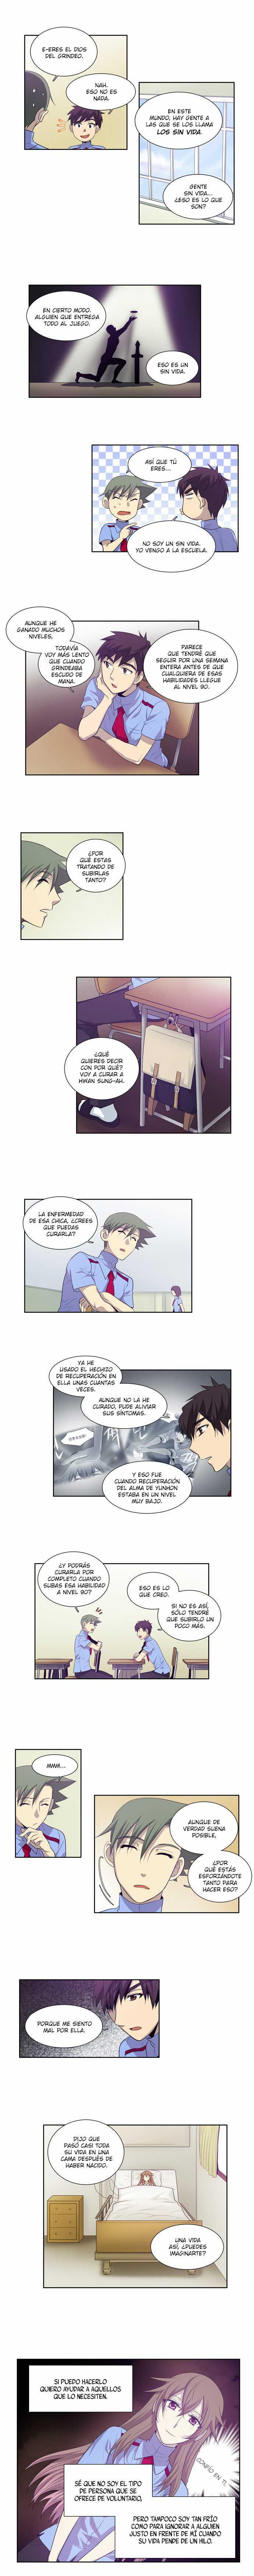 http://c5.ninemanga.com/es_manga/61/1725/364515/158223cf1707f7e6dd5cd3a0d64f89f3.jpg Page 5